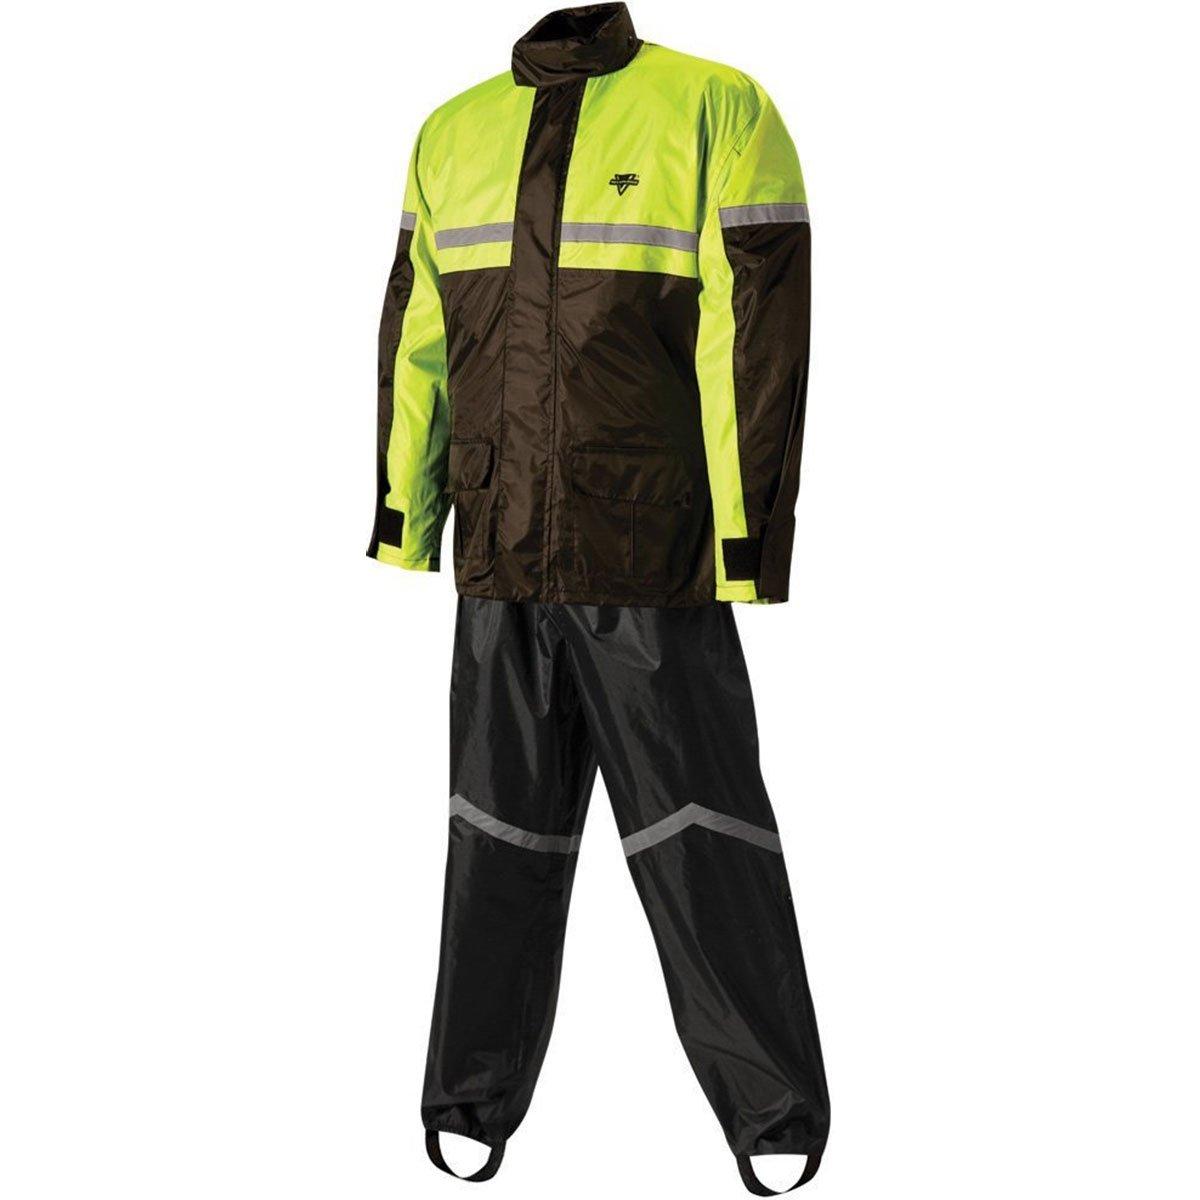 Nelson Rigg SR-6000 Black/Hi-Viz Yellow Stormrider 2-Piece Rain Suit - X-Large